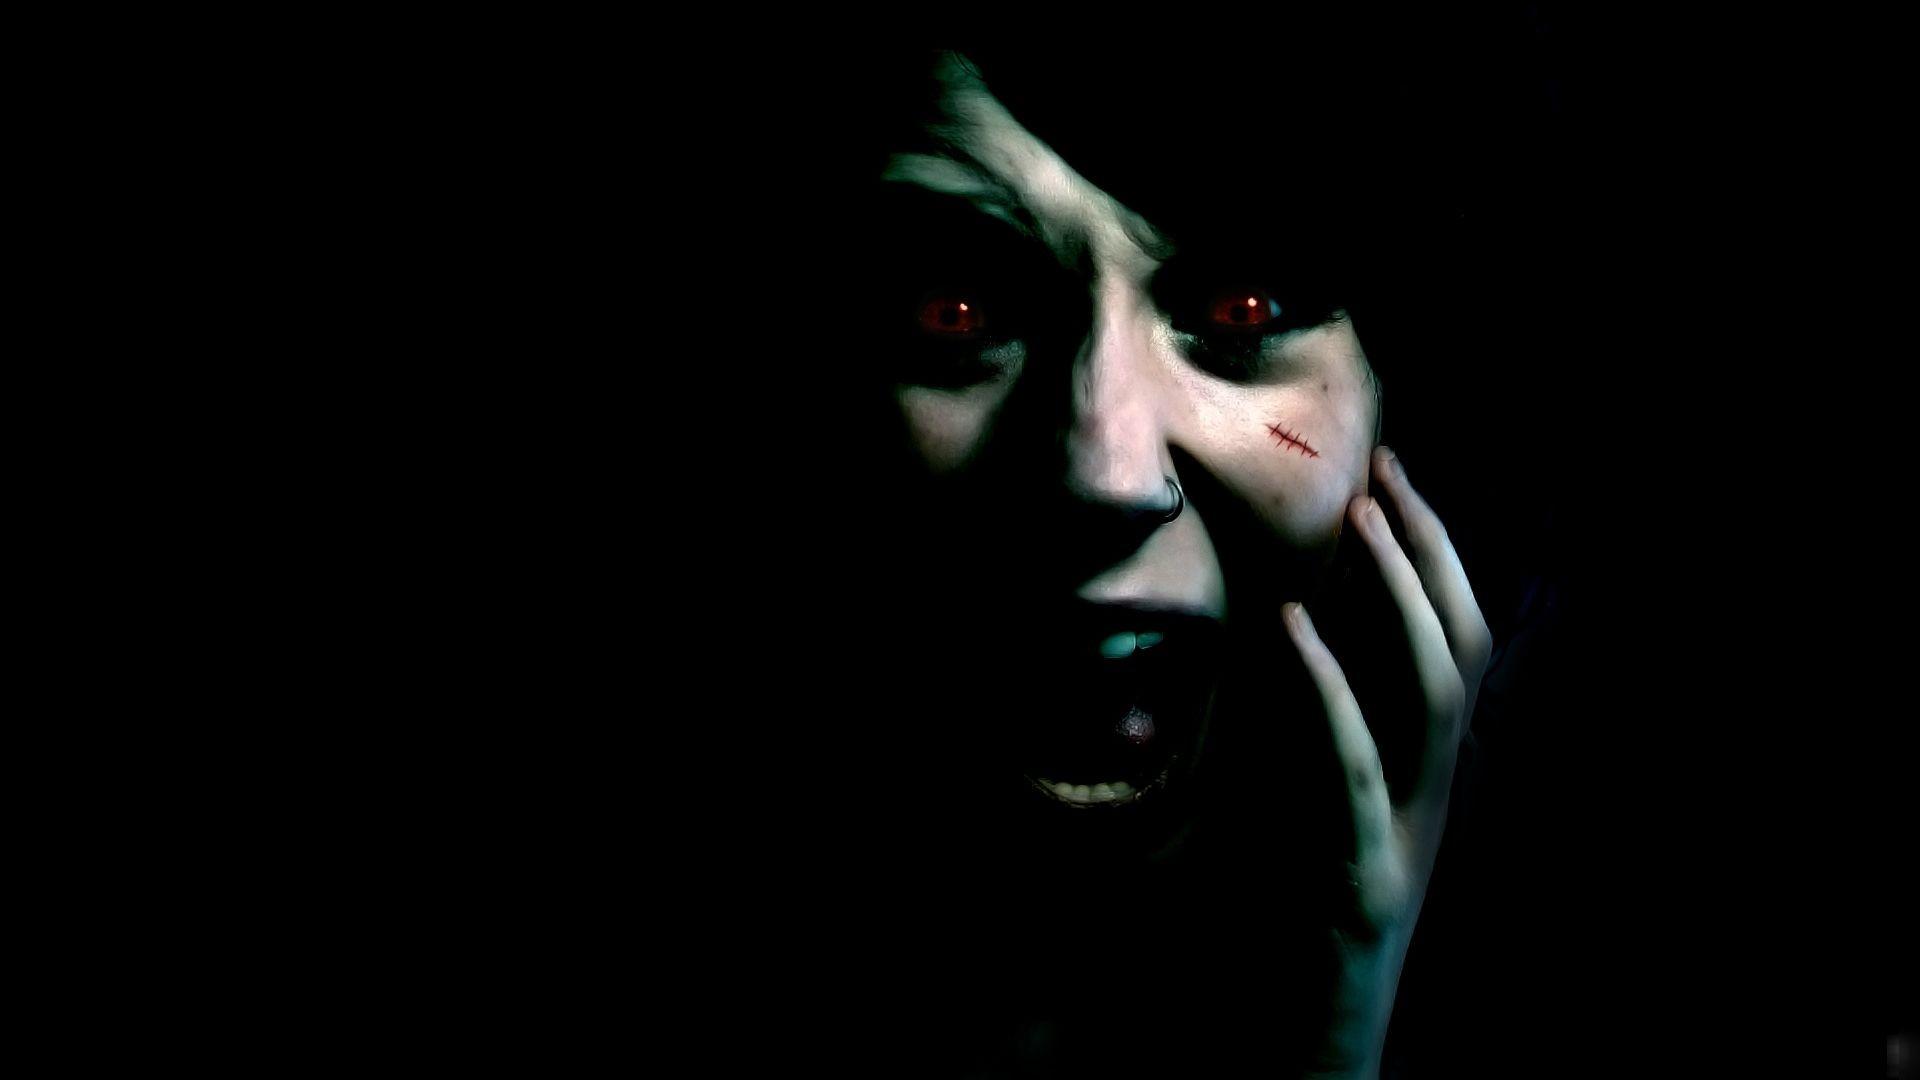 Scary - HD1920×1080